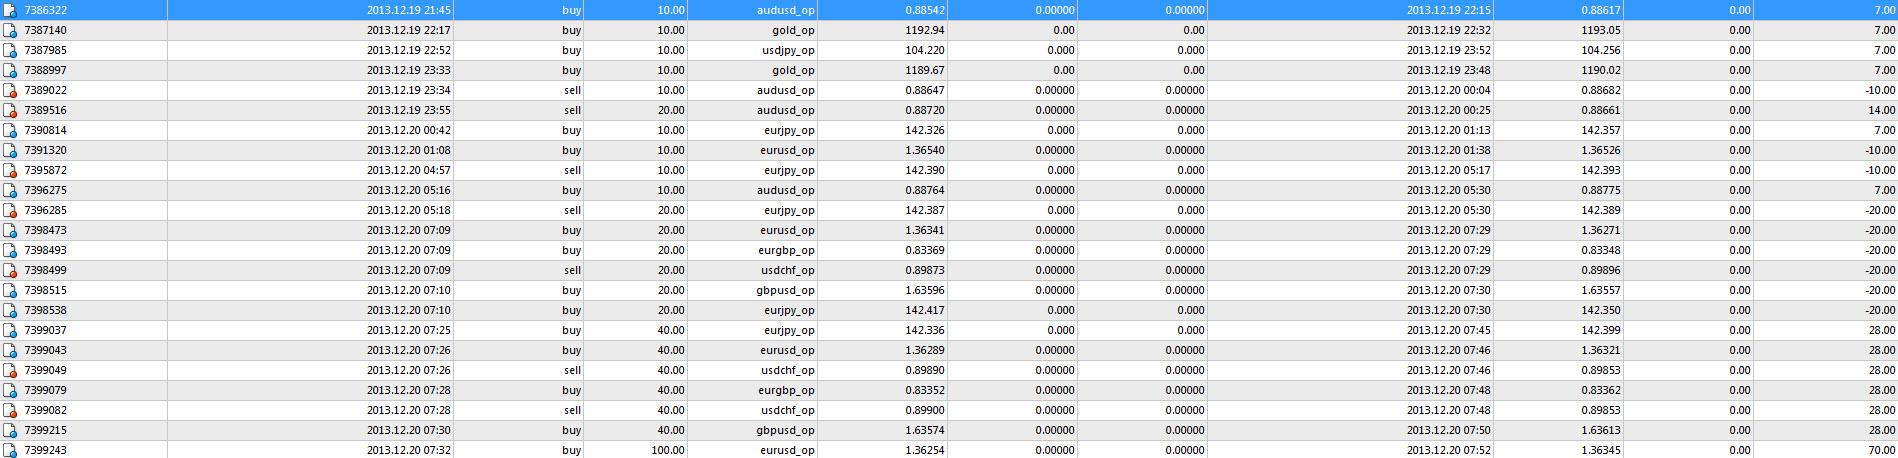 СТРАТЕГИЯ BINARY FOREX (100%) 488f88becaeda3b124de63e17669d65c